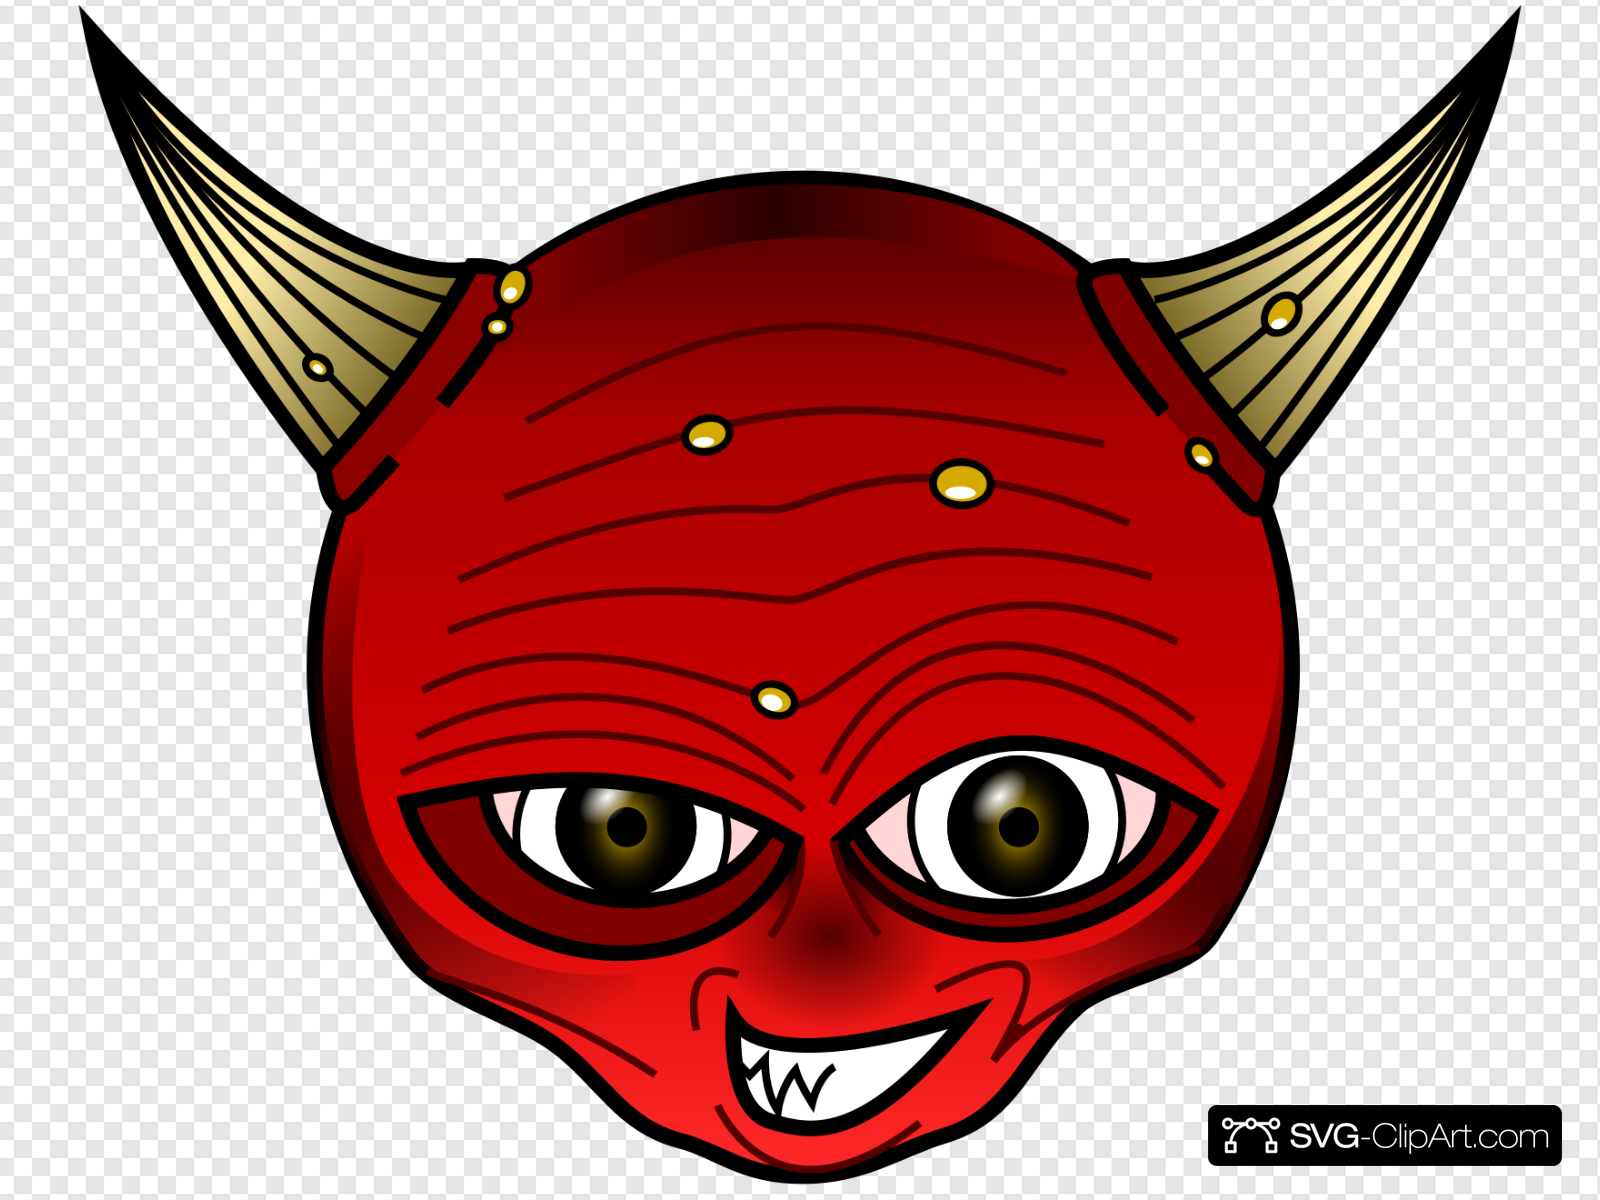 Red Devil Clip art, Icon and SVG.